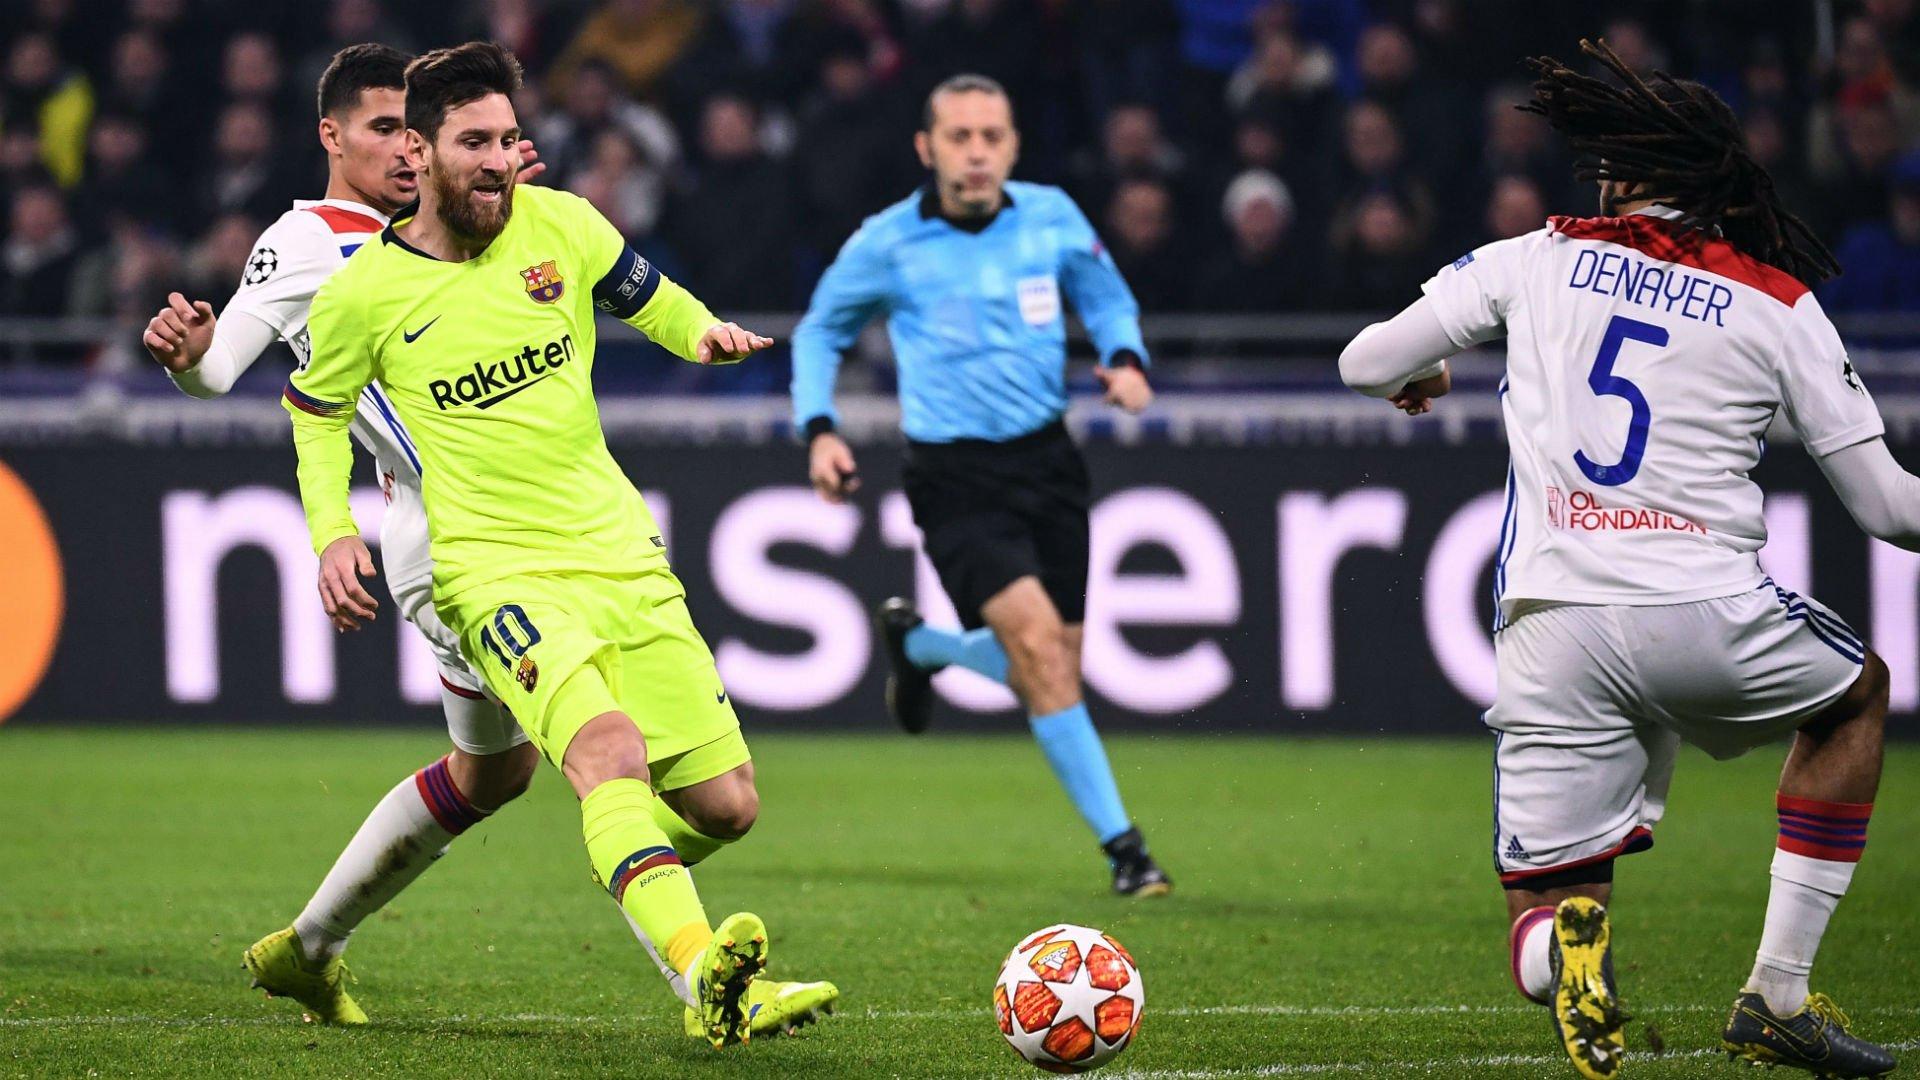 مشاهدة مباراة برشلونة وليون بث مباشر